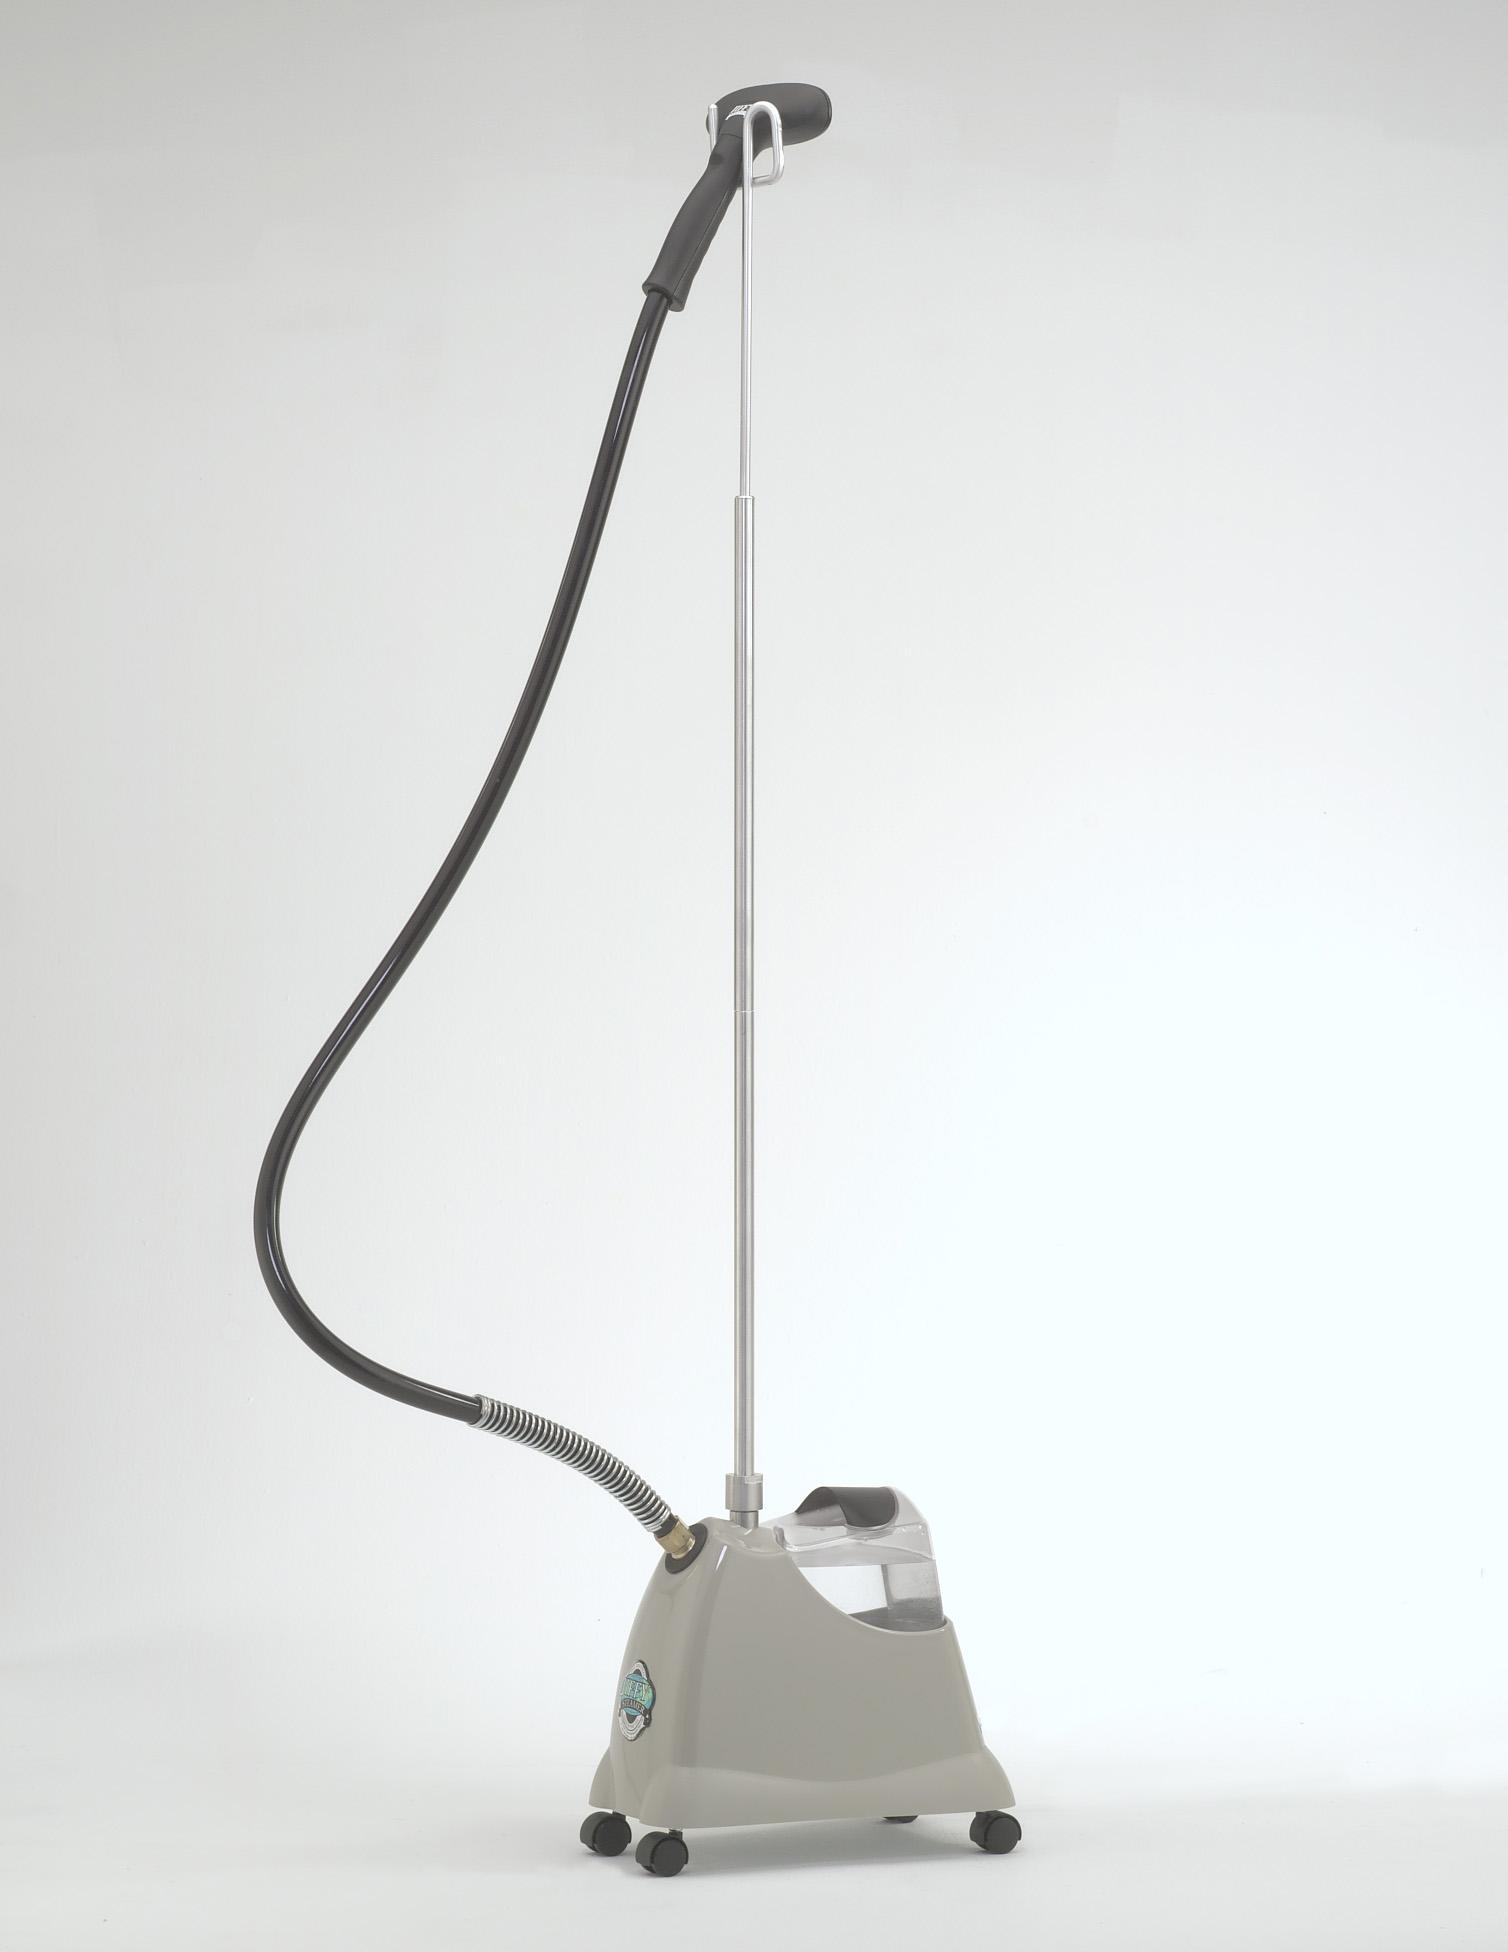 Jiffy J2000 Garment Steamer